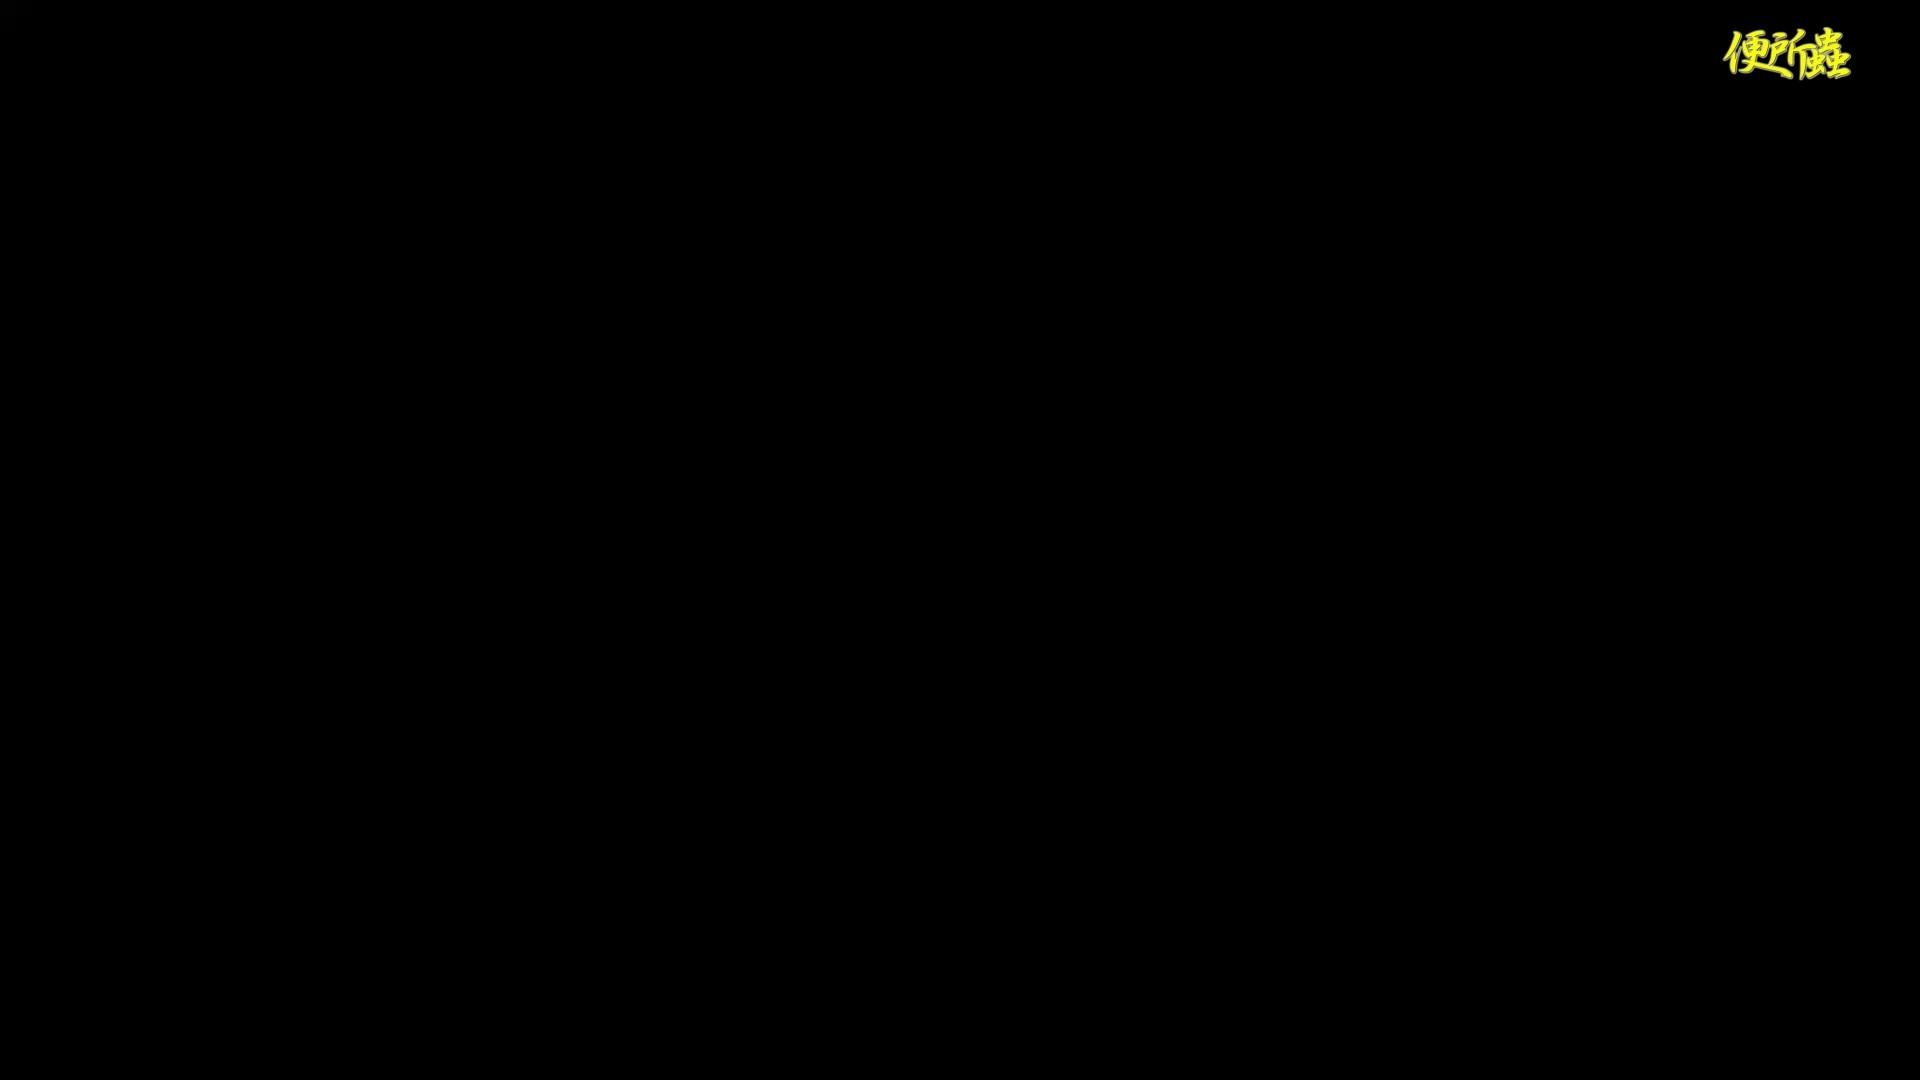 vol.07 便所蟲さんのリターン~寺子屋洗面所盗撮~※画質改善※総勢7名 高画質動画 セックス無修正動画無料 79画像 6